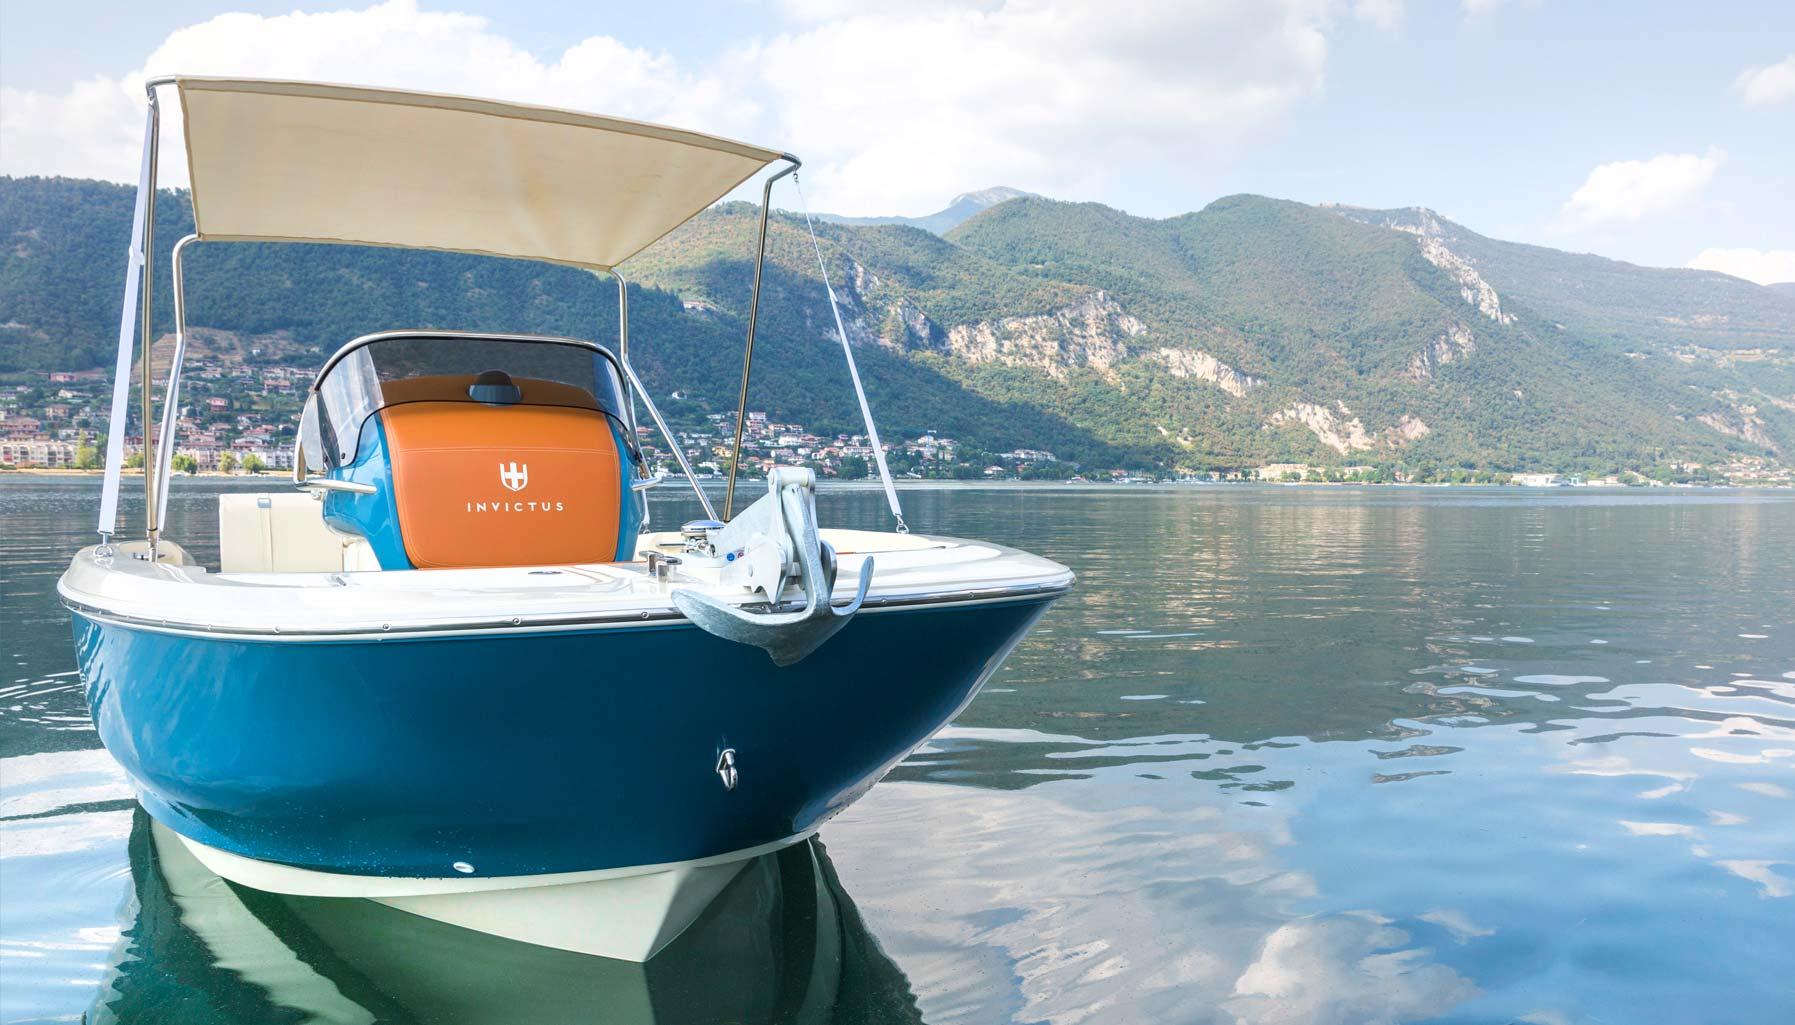 Invictus 200FX yacht